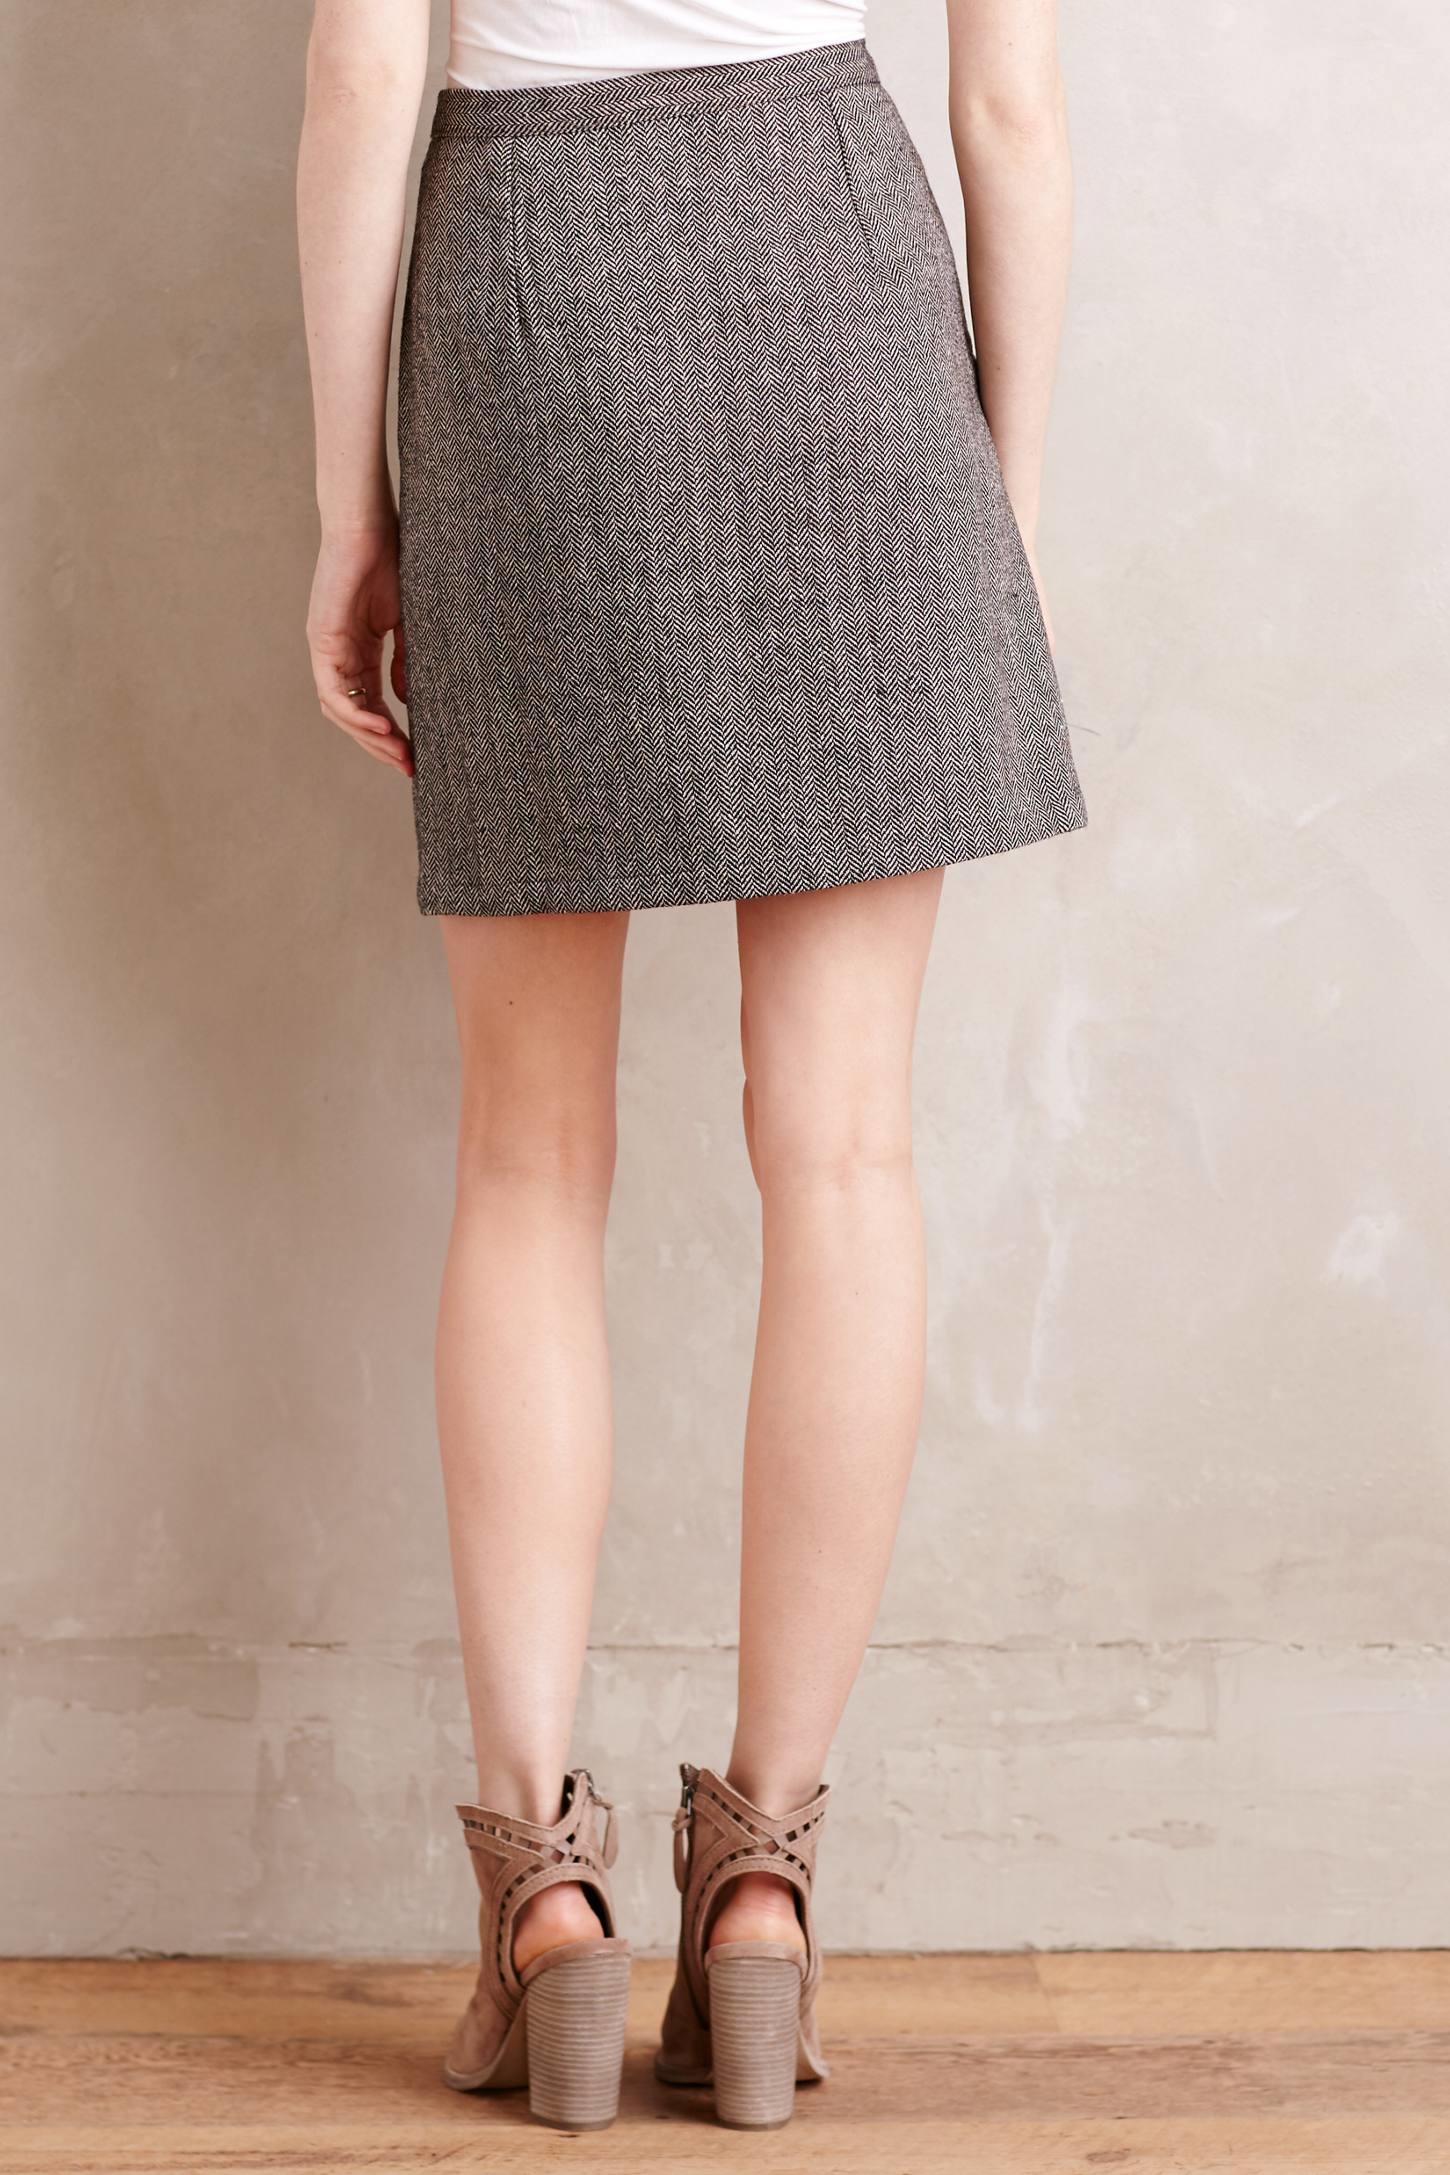 Hemant & nandita Embroidered Wool Mini Skirt in Gray | Lyst